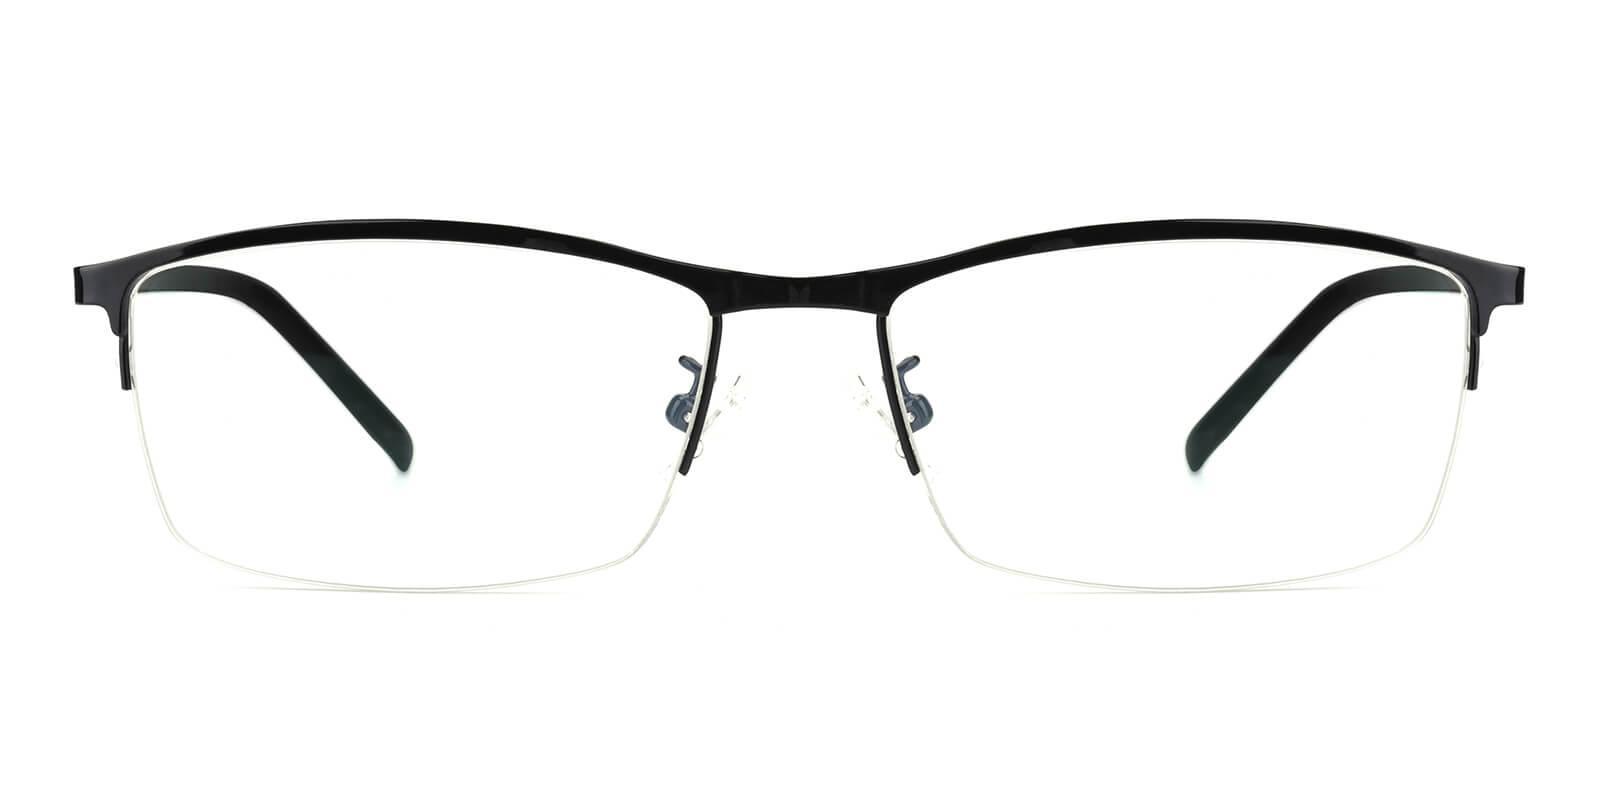 Elegant-Black-Rectangle-Metal-Eyeglasses-additional2